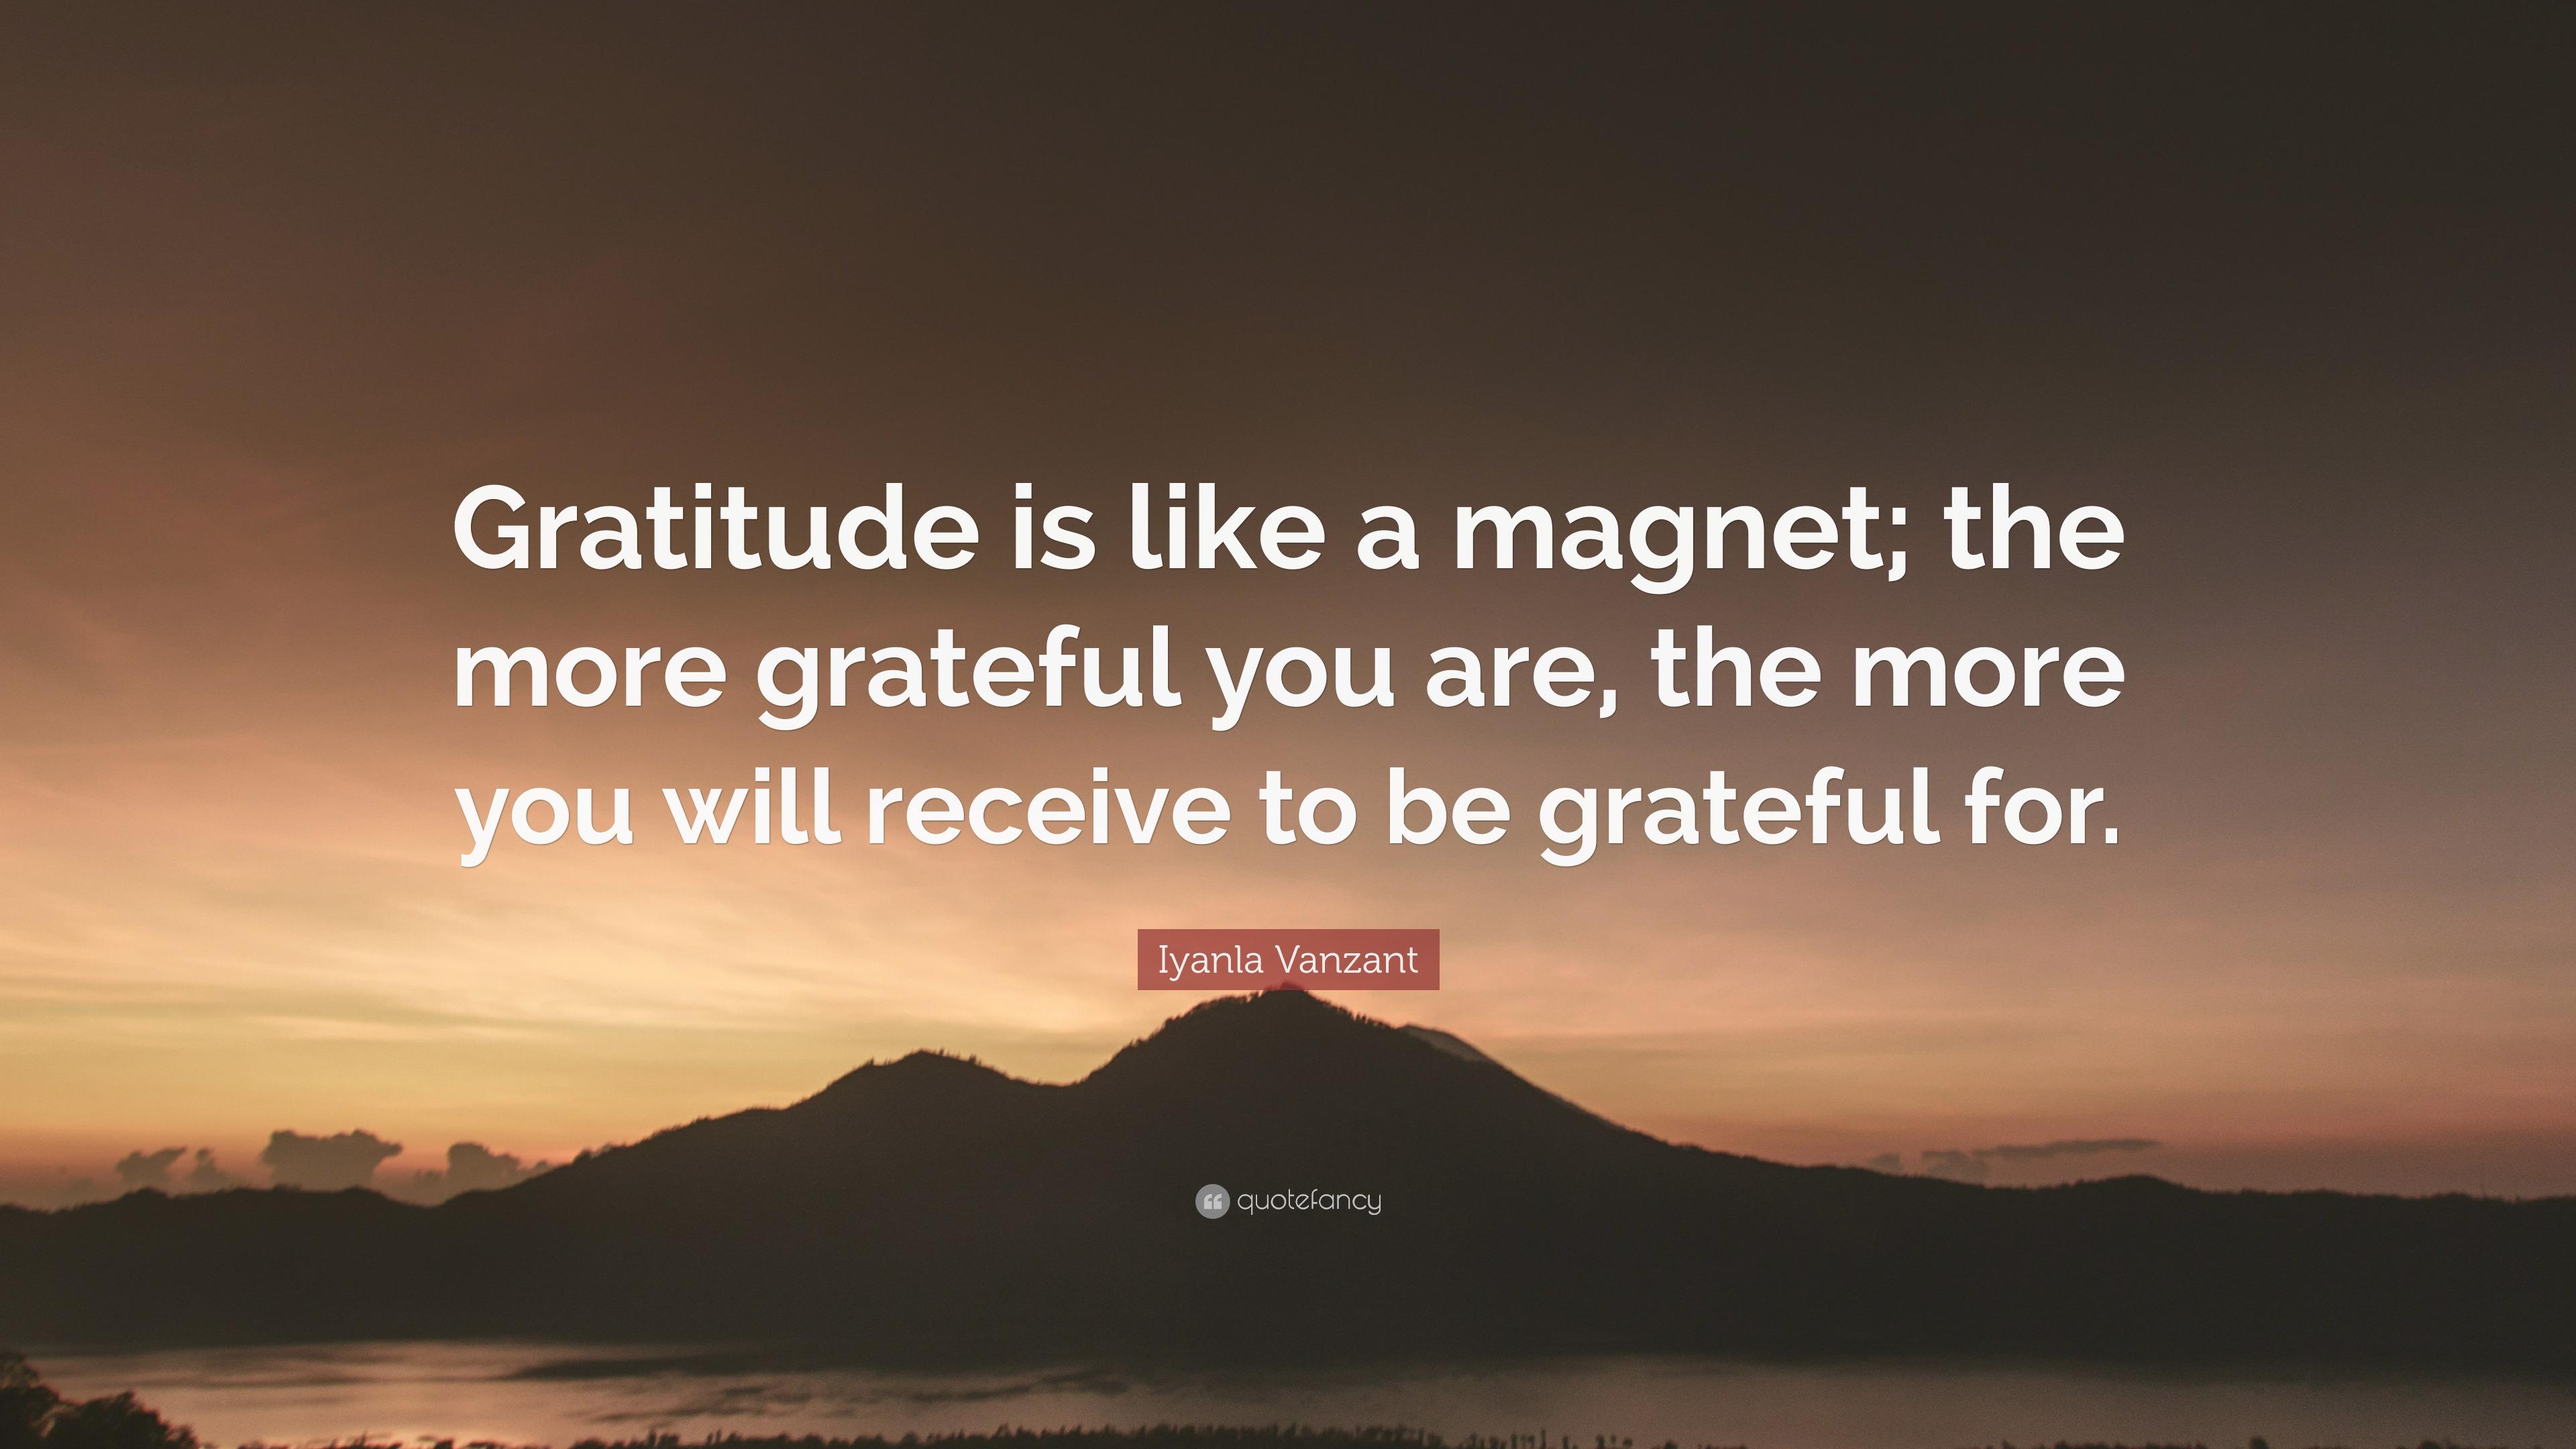 Iyanla Vanzant Quotes | Iyanla Vanzant Quote Gratitude Is Like A Magnet The More Grateful